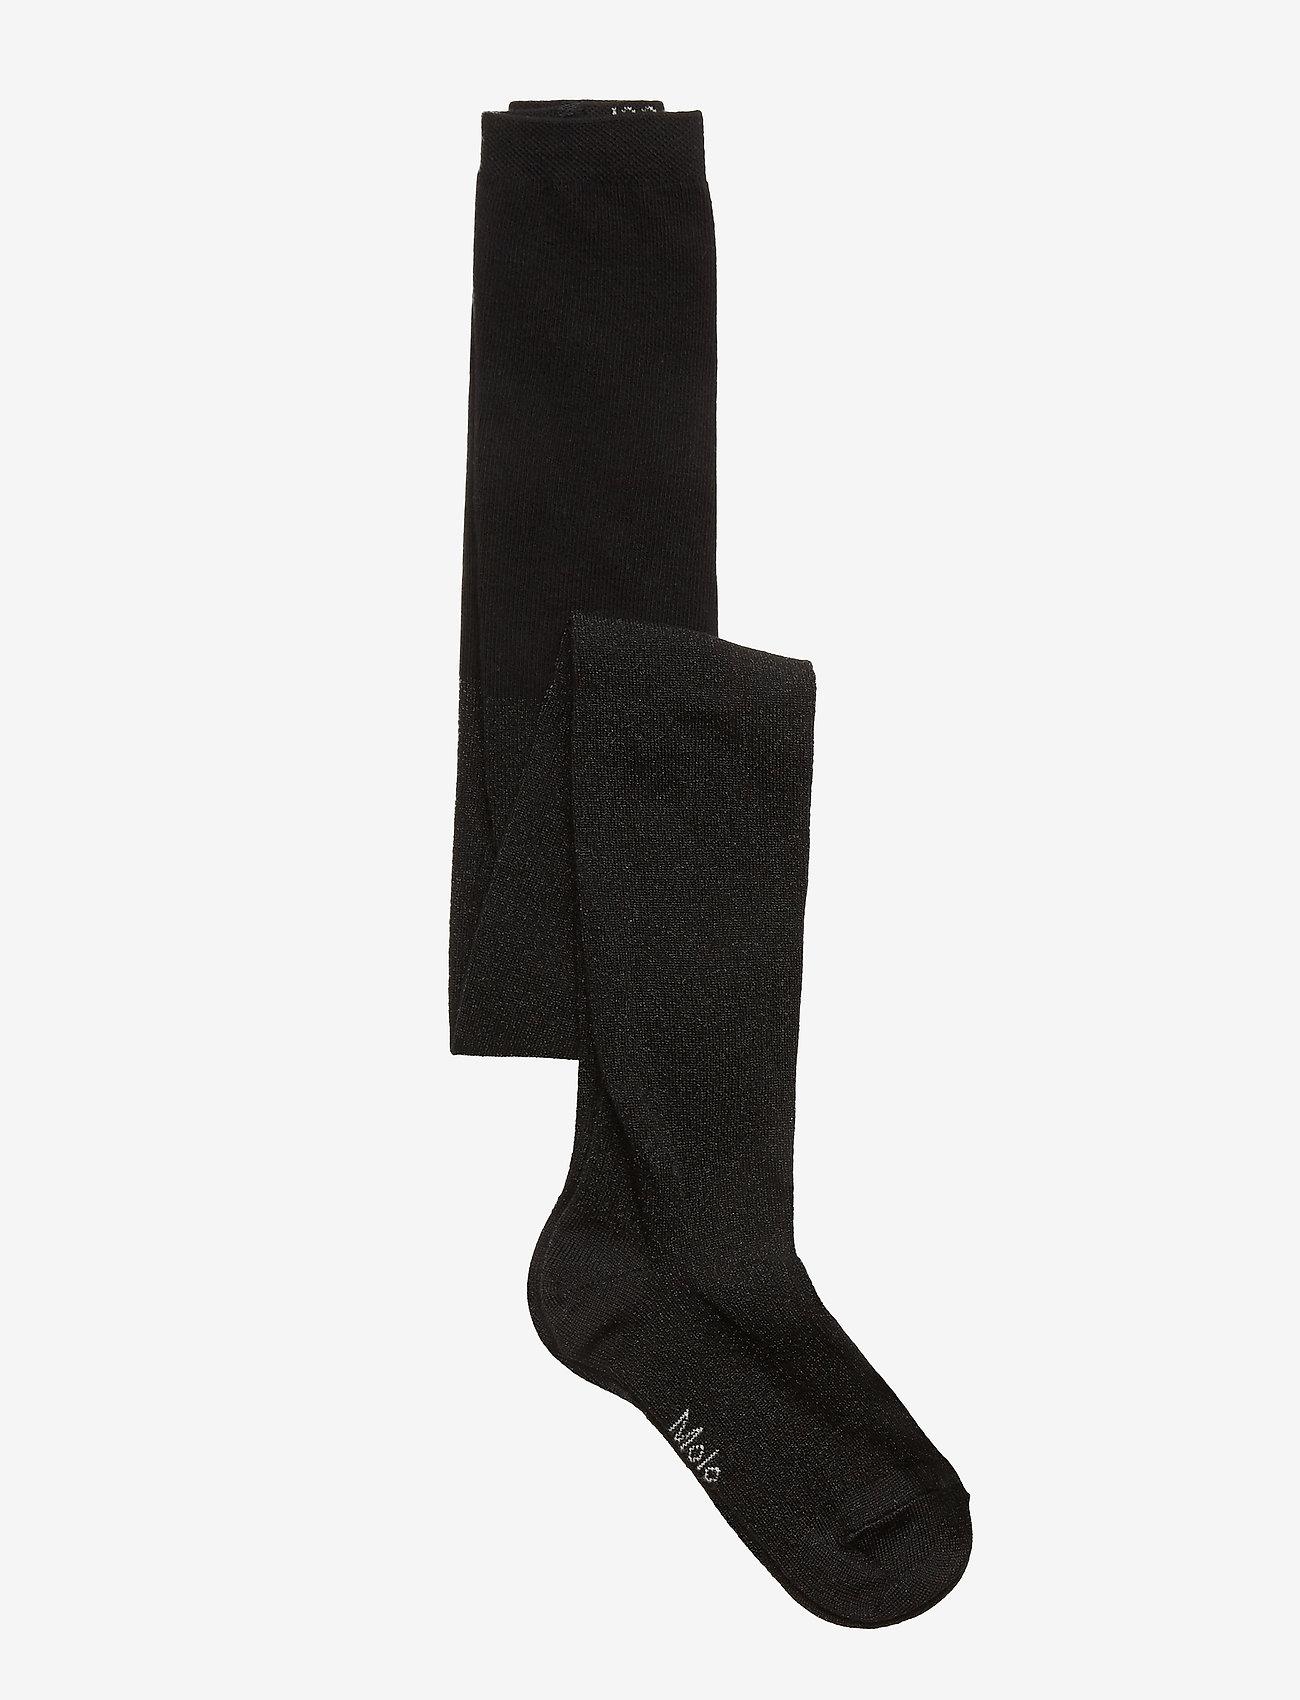 Molo - Glitter tights - strømpebukser - black - 0